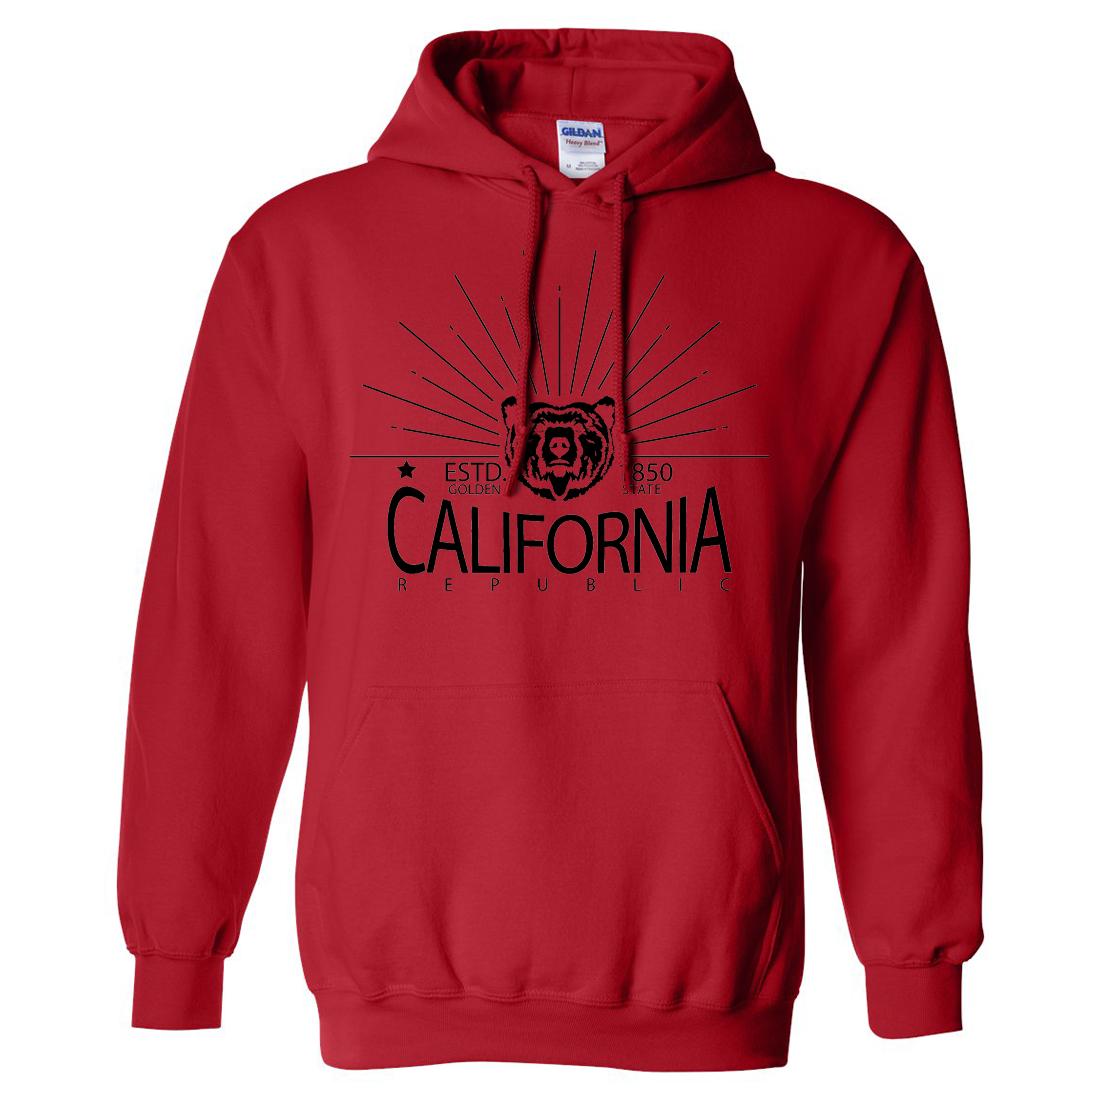 California Golden State Black Print Sweatshirt Hoodie